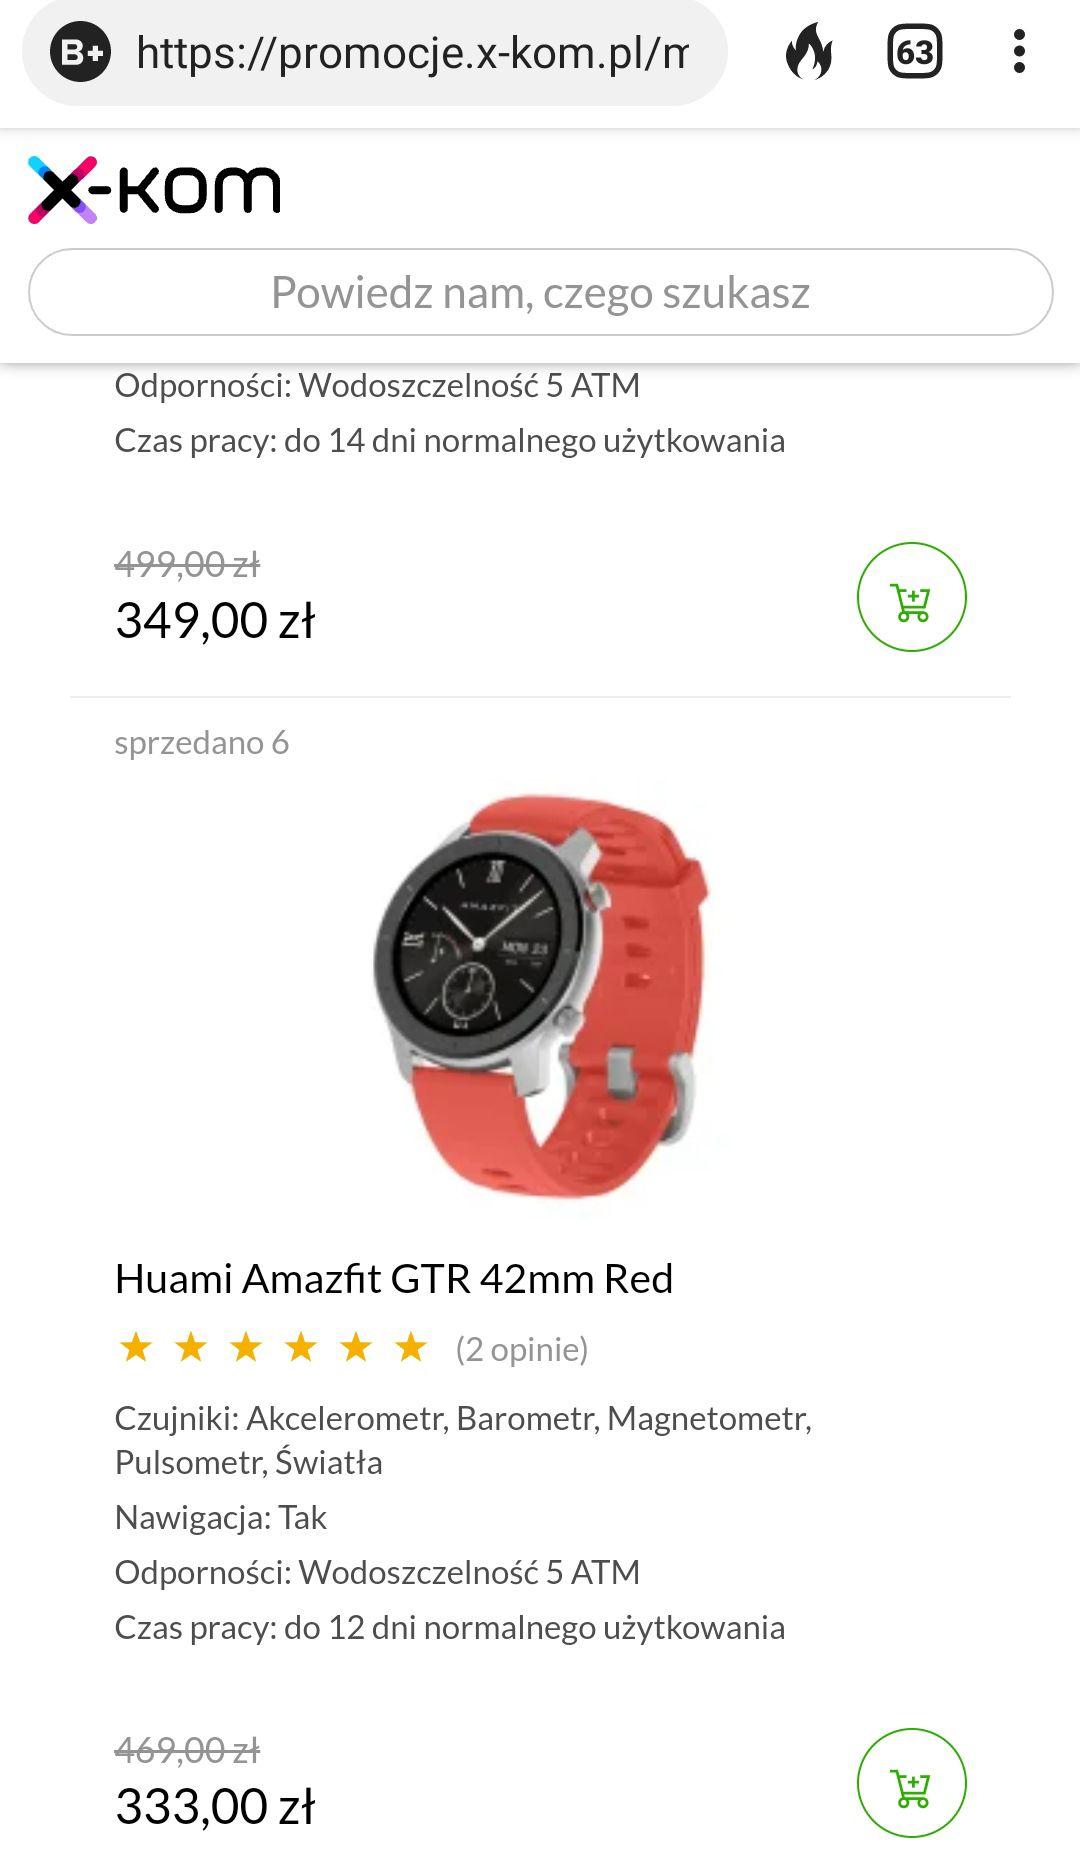 Smartwatch Huami Amazfit GTR 42mm Red